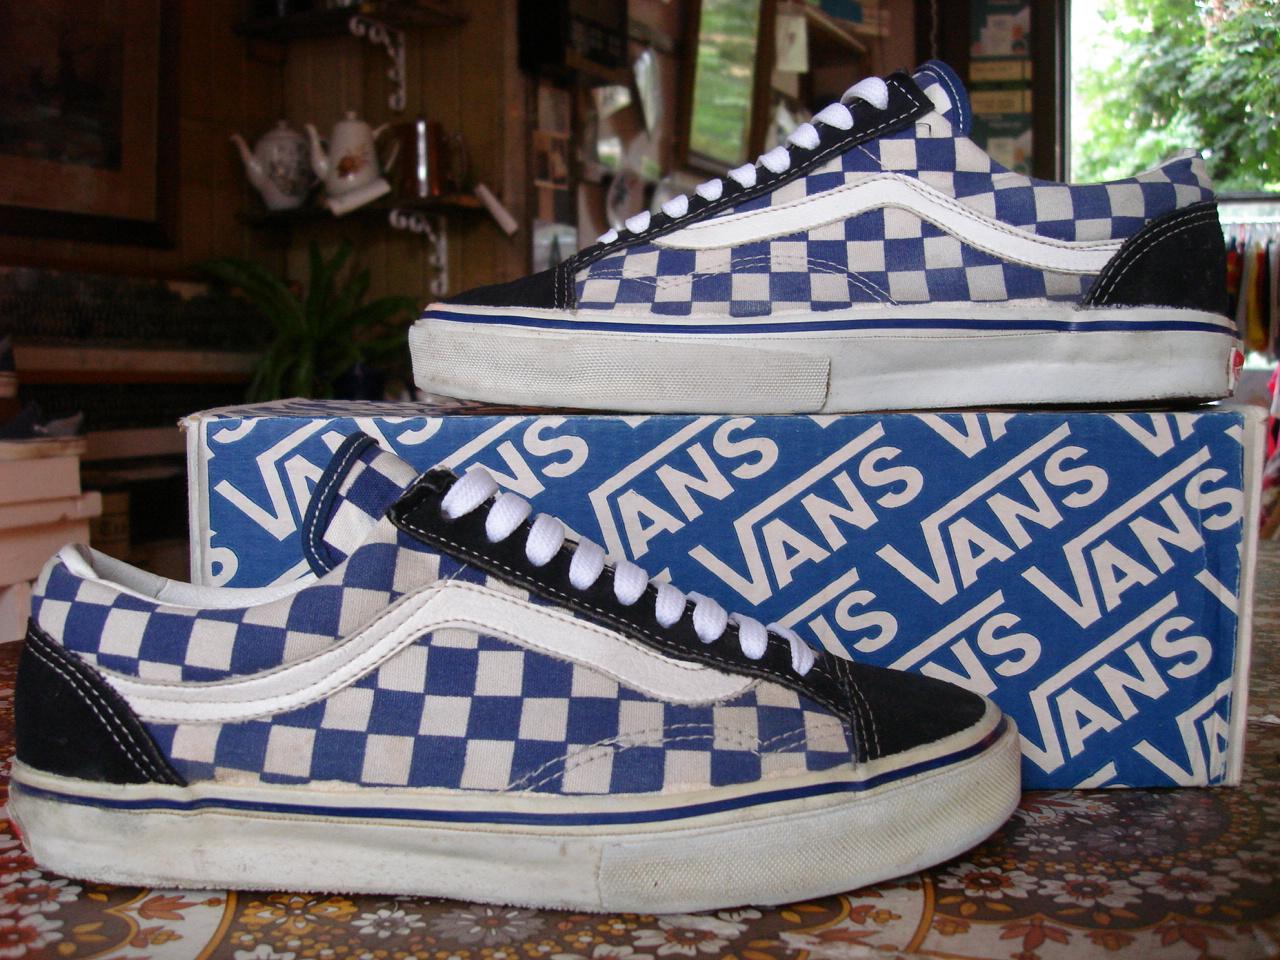 957c6418534241 Buy navy blue checkered vans